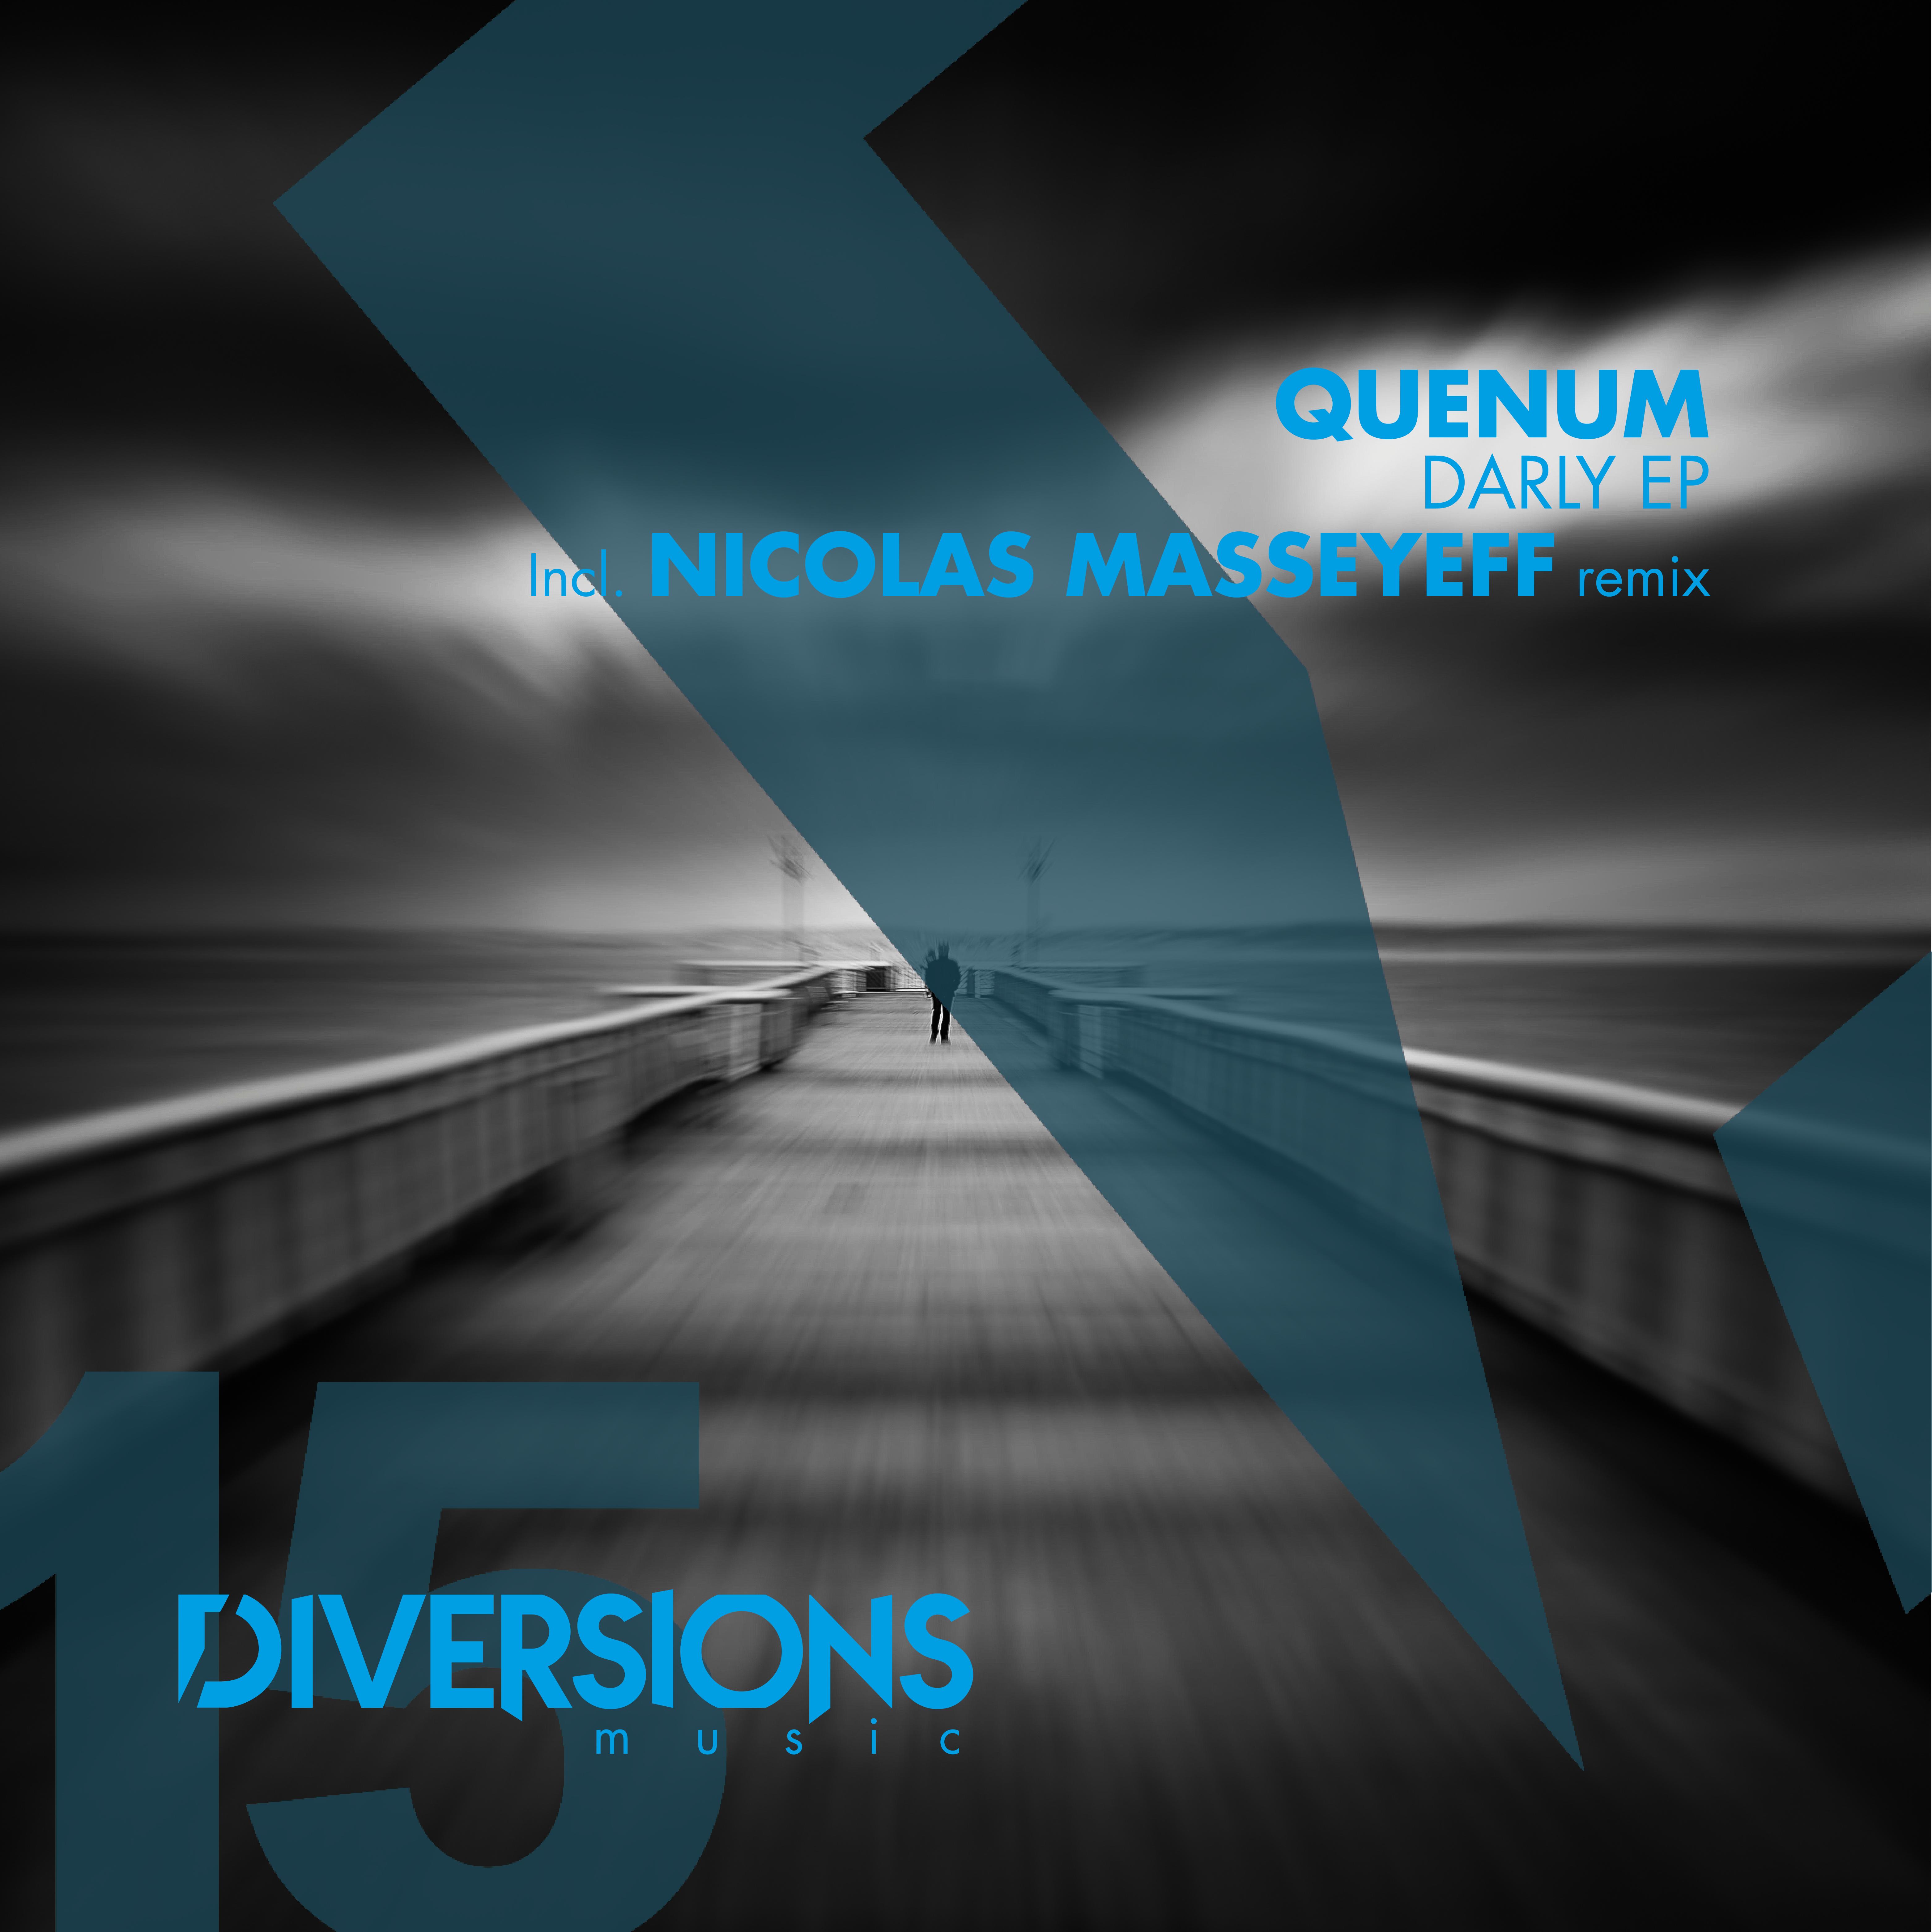 Quenum - Darly EP  Image